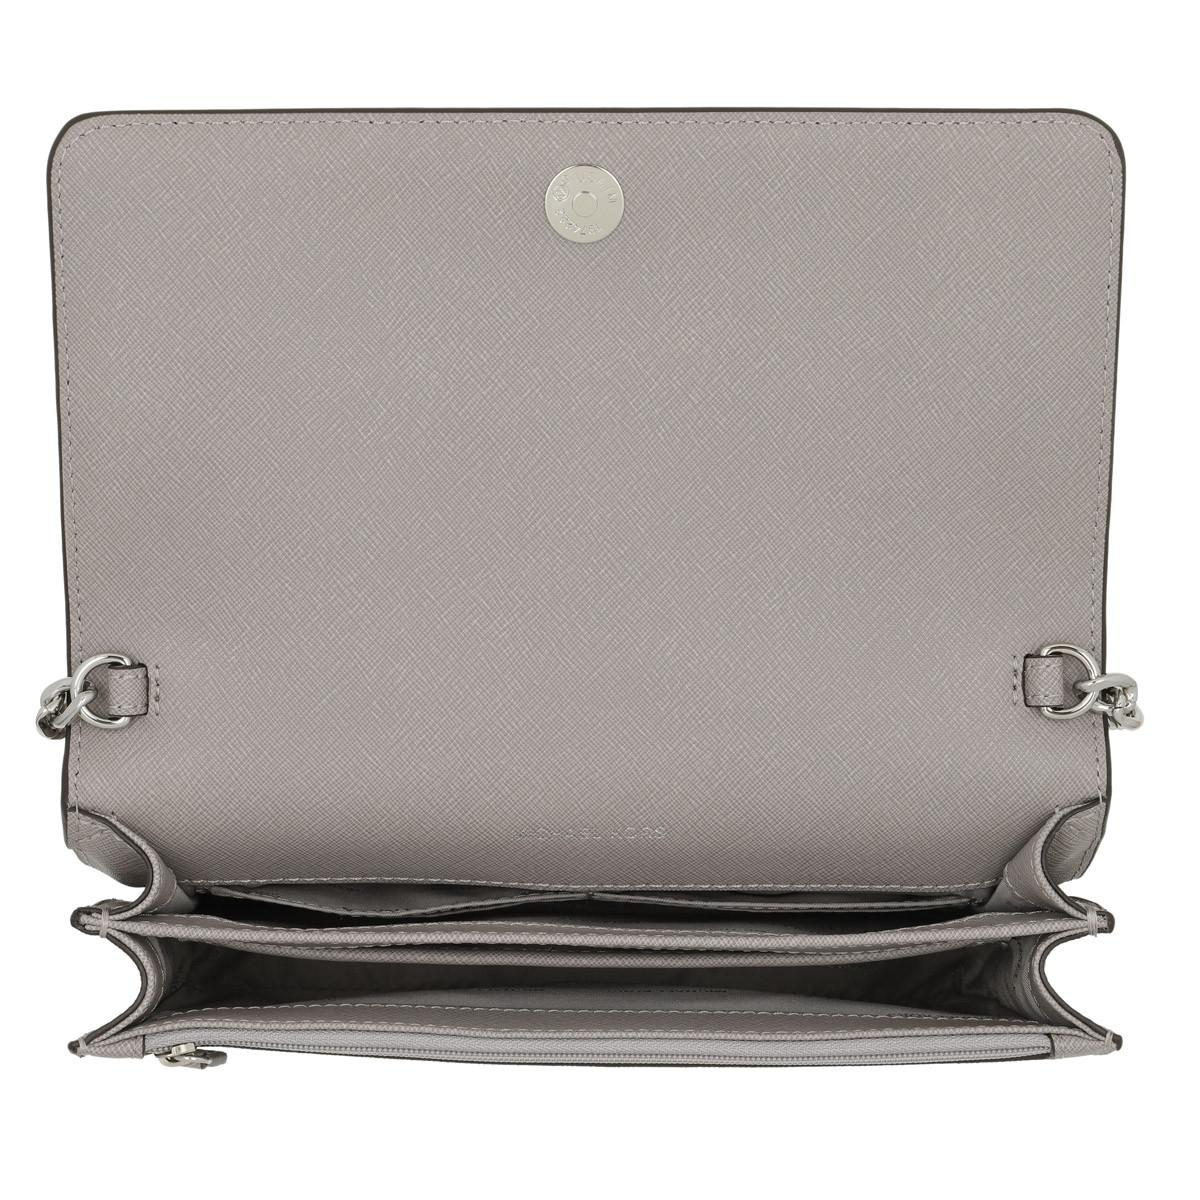 bc2b1924f8a4 Michael Kors Large Gusset Crossbody Bag Pearl Grey in Gray - Lyst